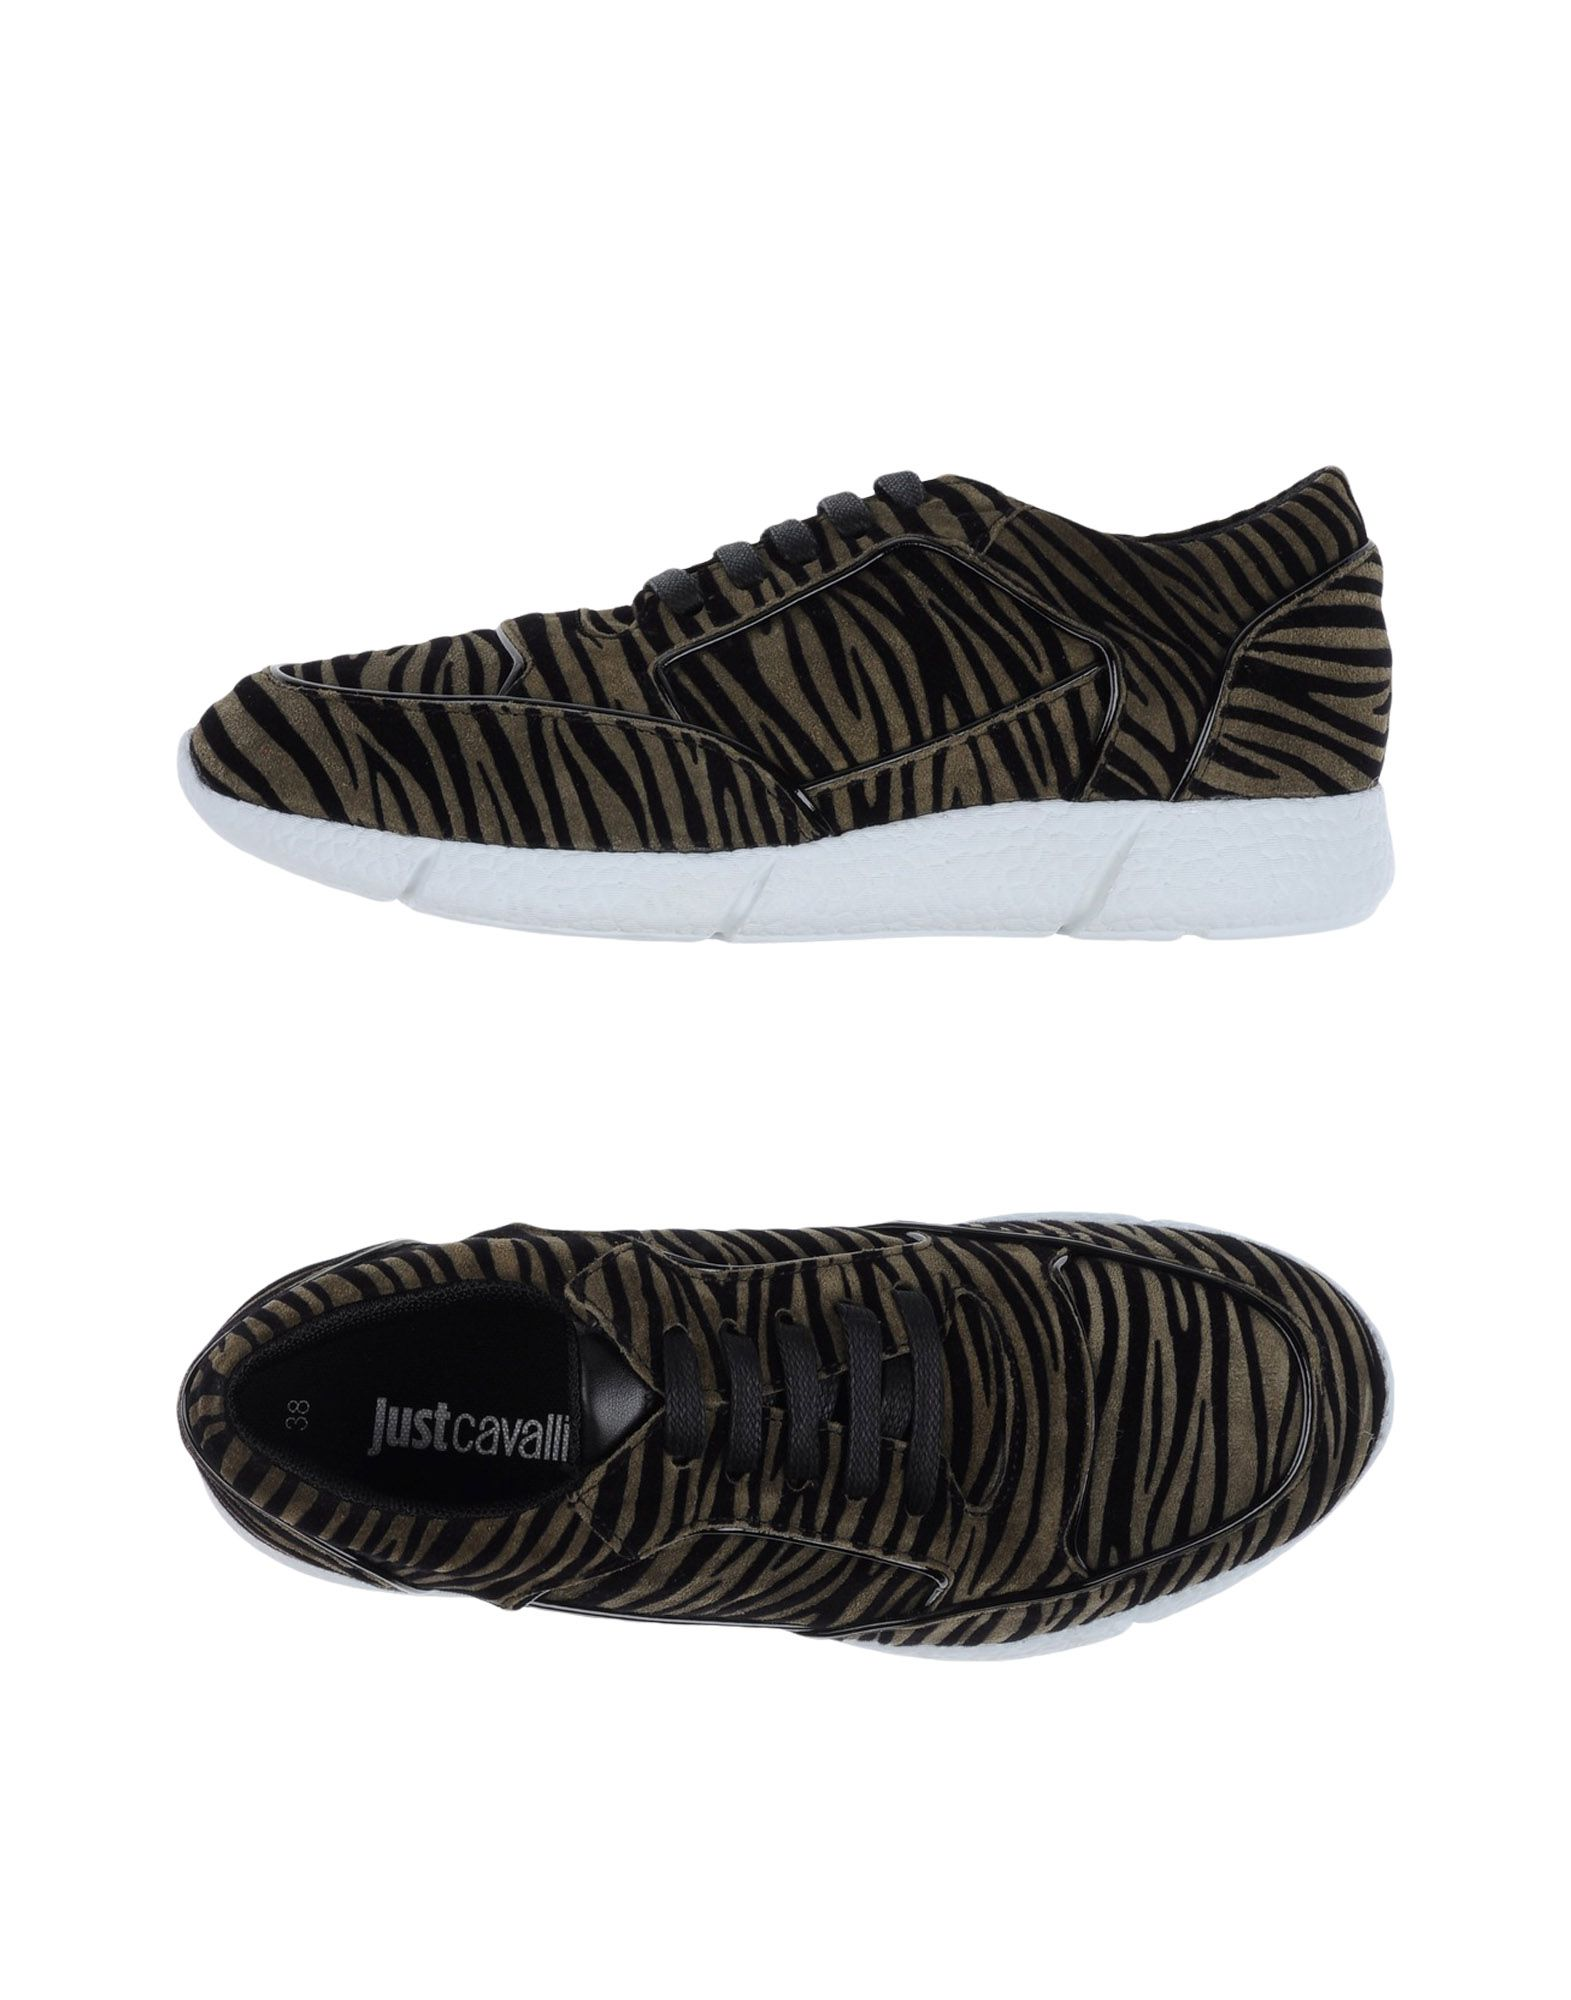 Just Cavalli Sneakers Damen  11251394ML Gute Qualität beliebte Schuhe